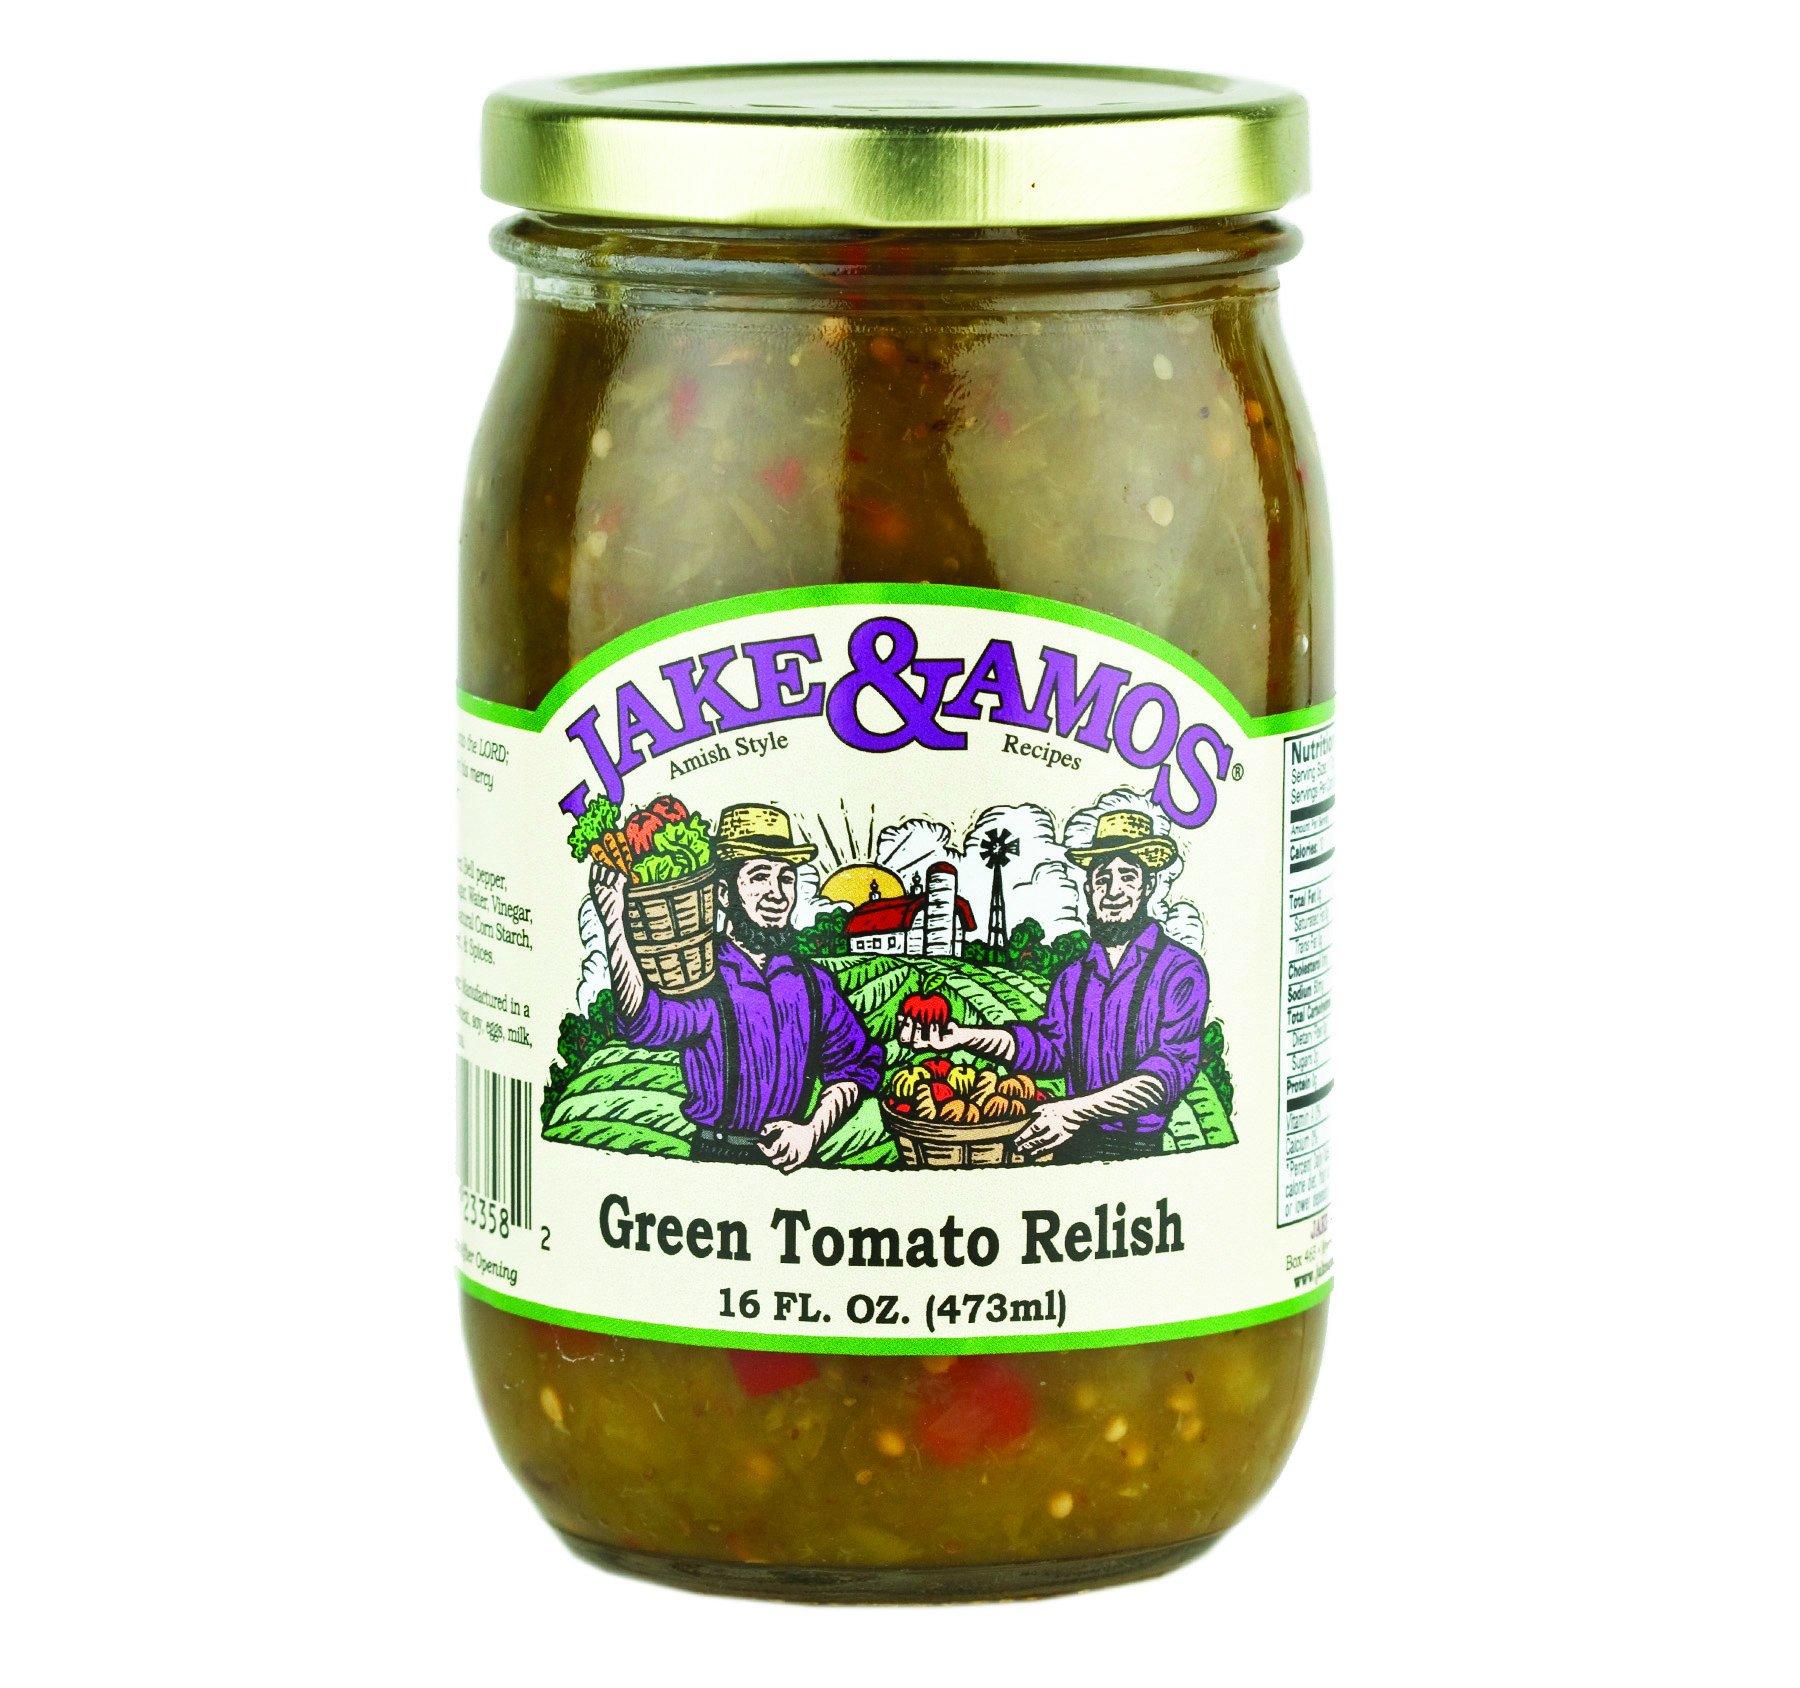 Jake & Amos Green Tomato Relish 16 oz. (3 Jars) by Jake & Amos